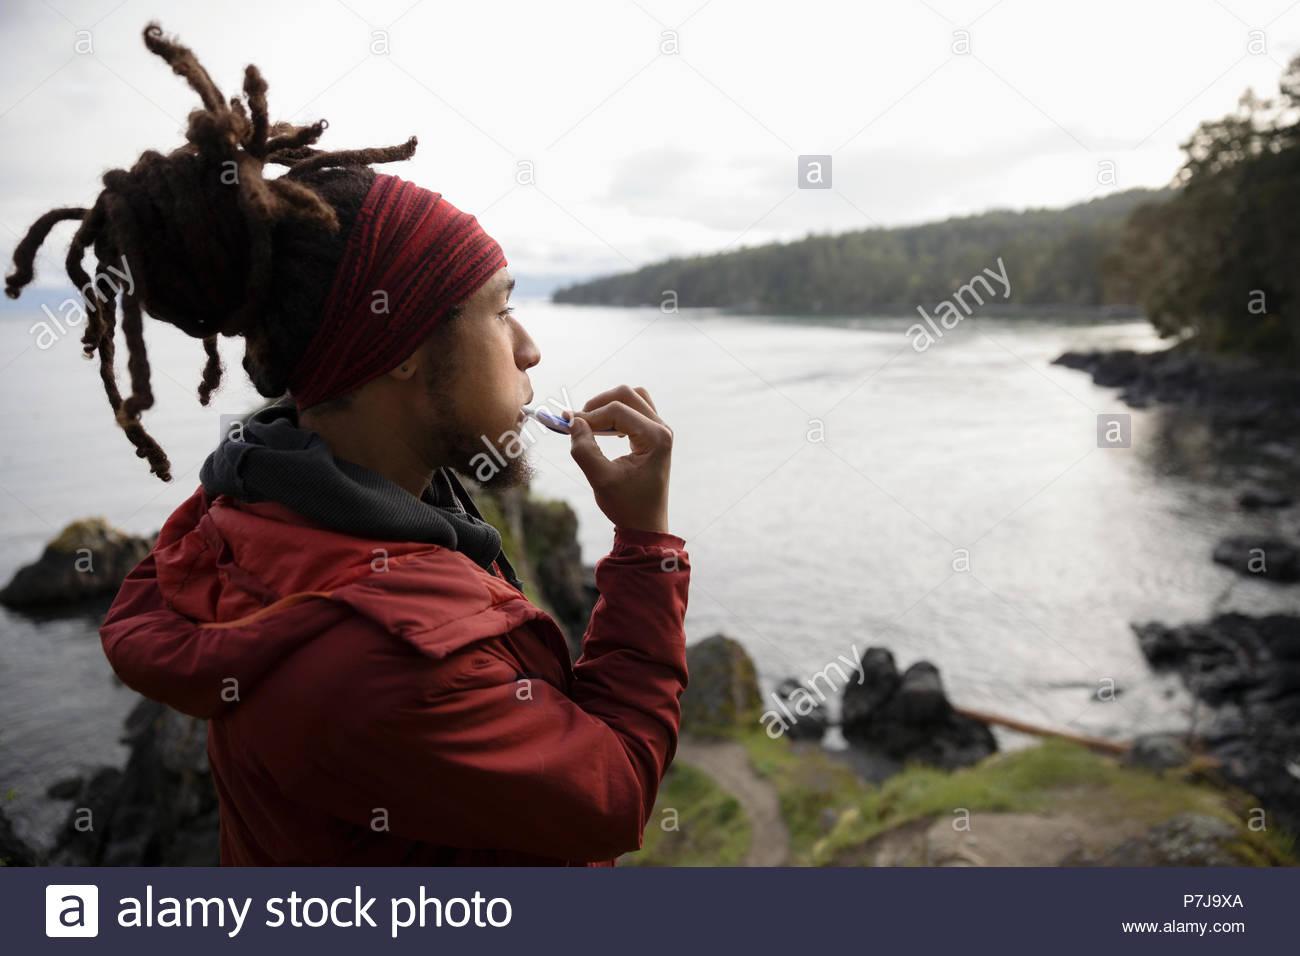 Male backpacker brushing teeth on cliff overlooking ocean - Stock Image